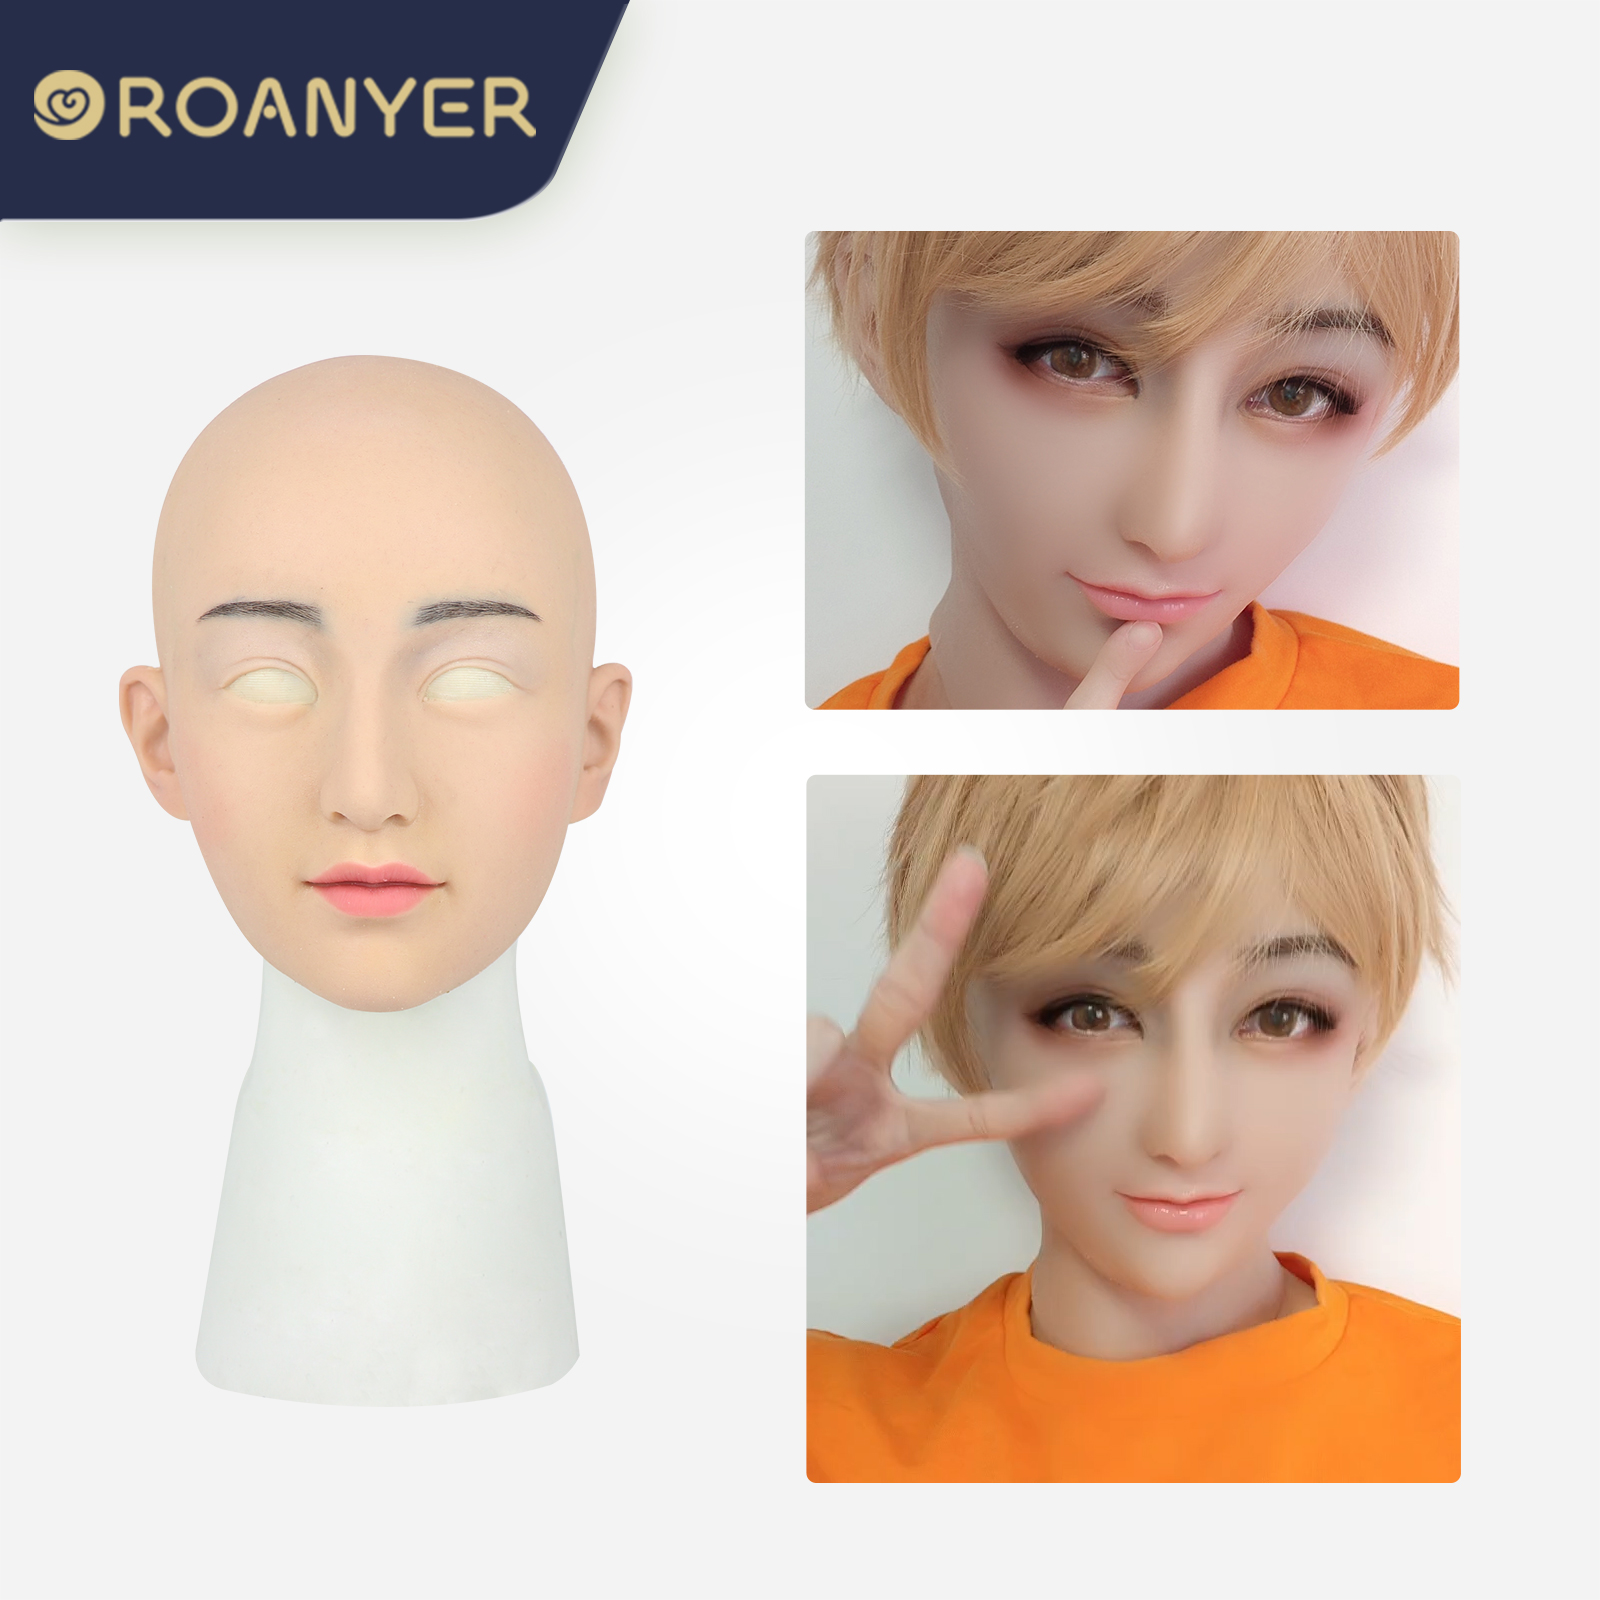 ROANYER 男の娘 女装 仮面 変装 マスク美人面具M4 new